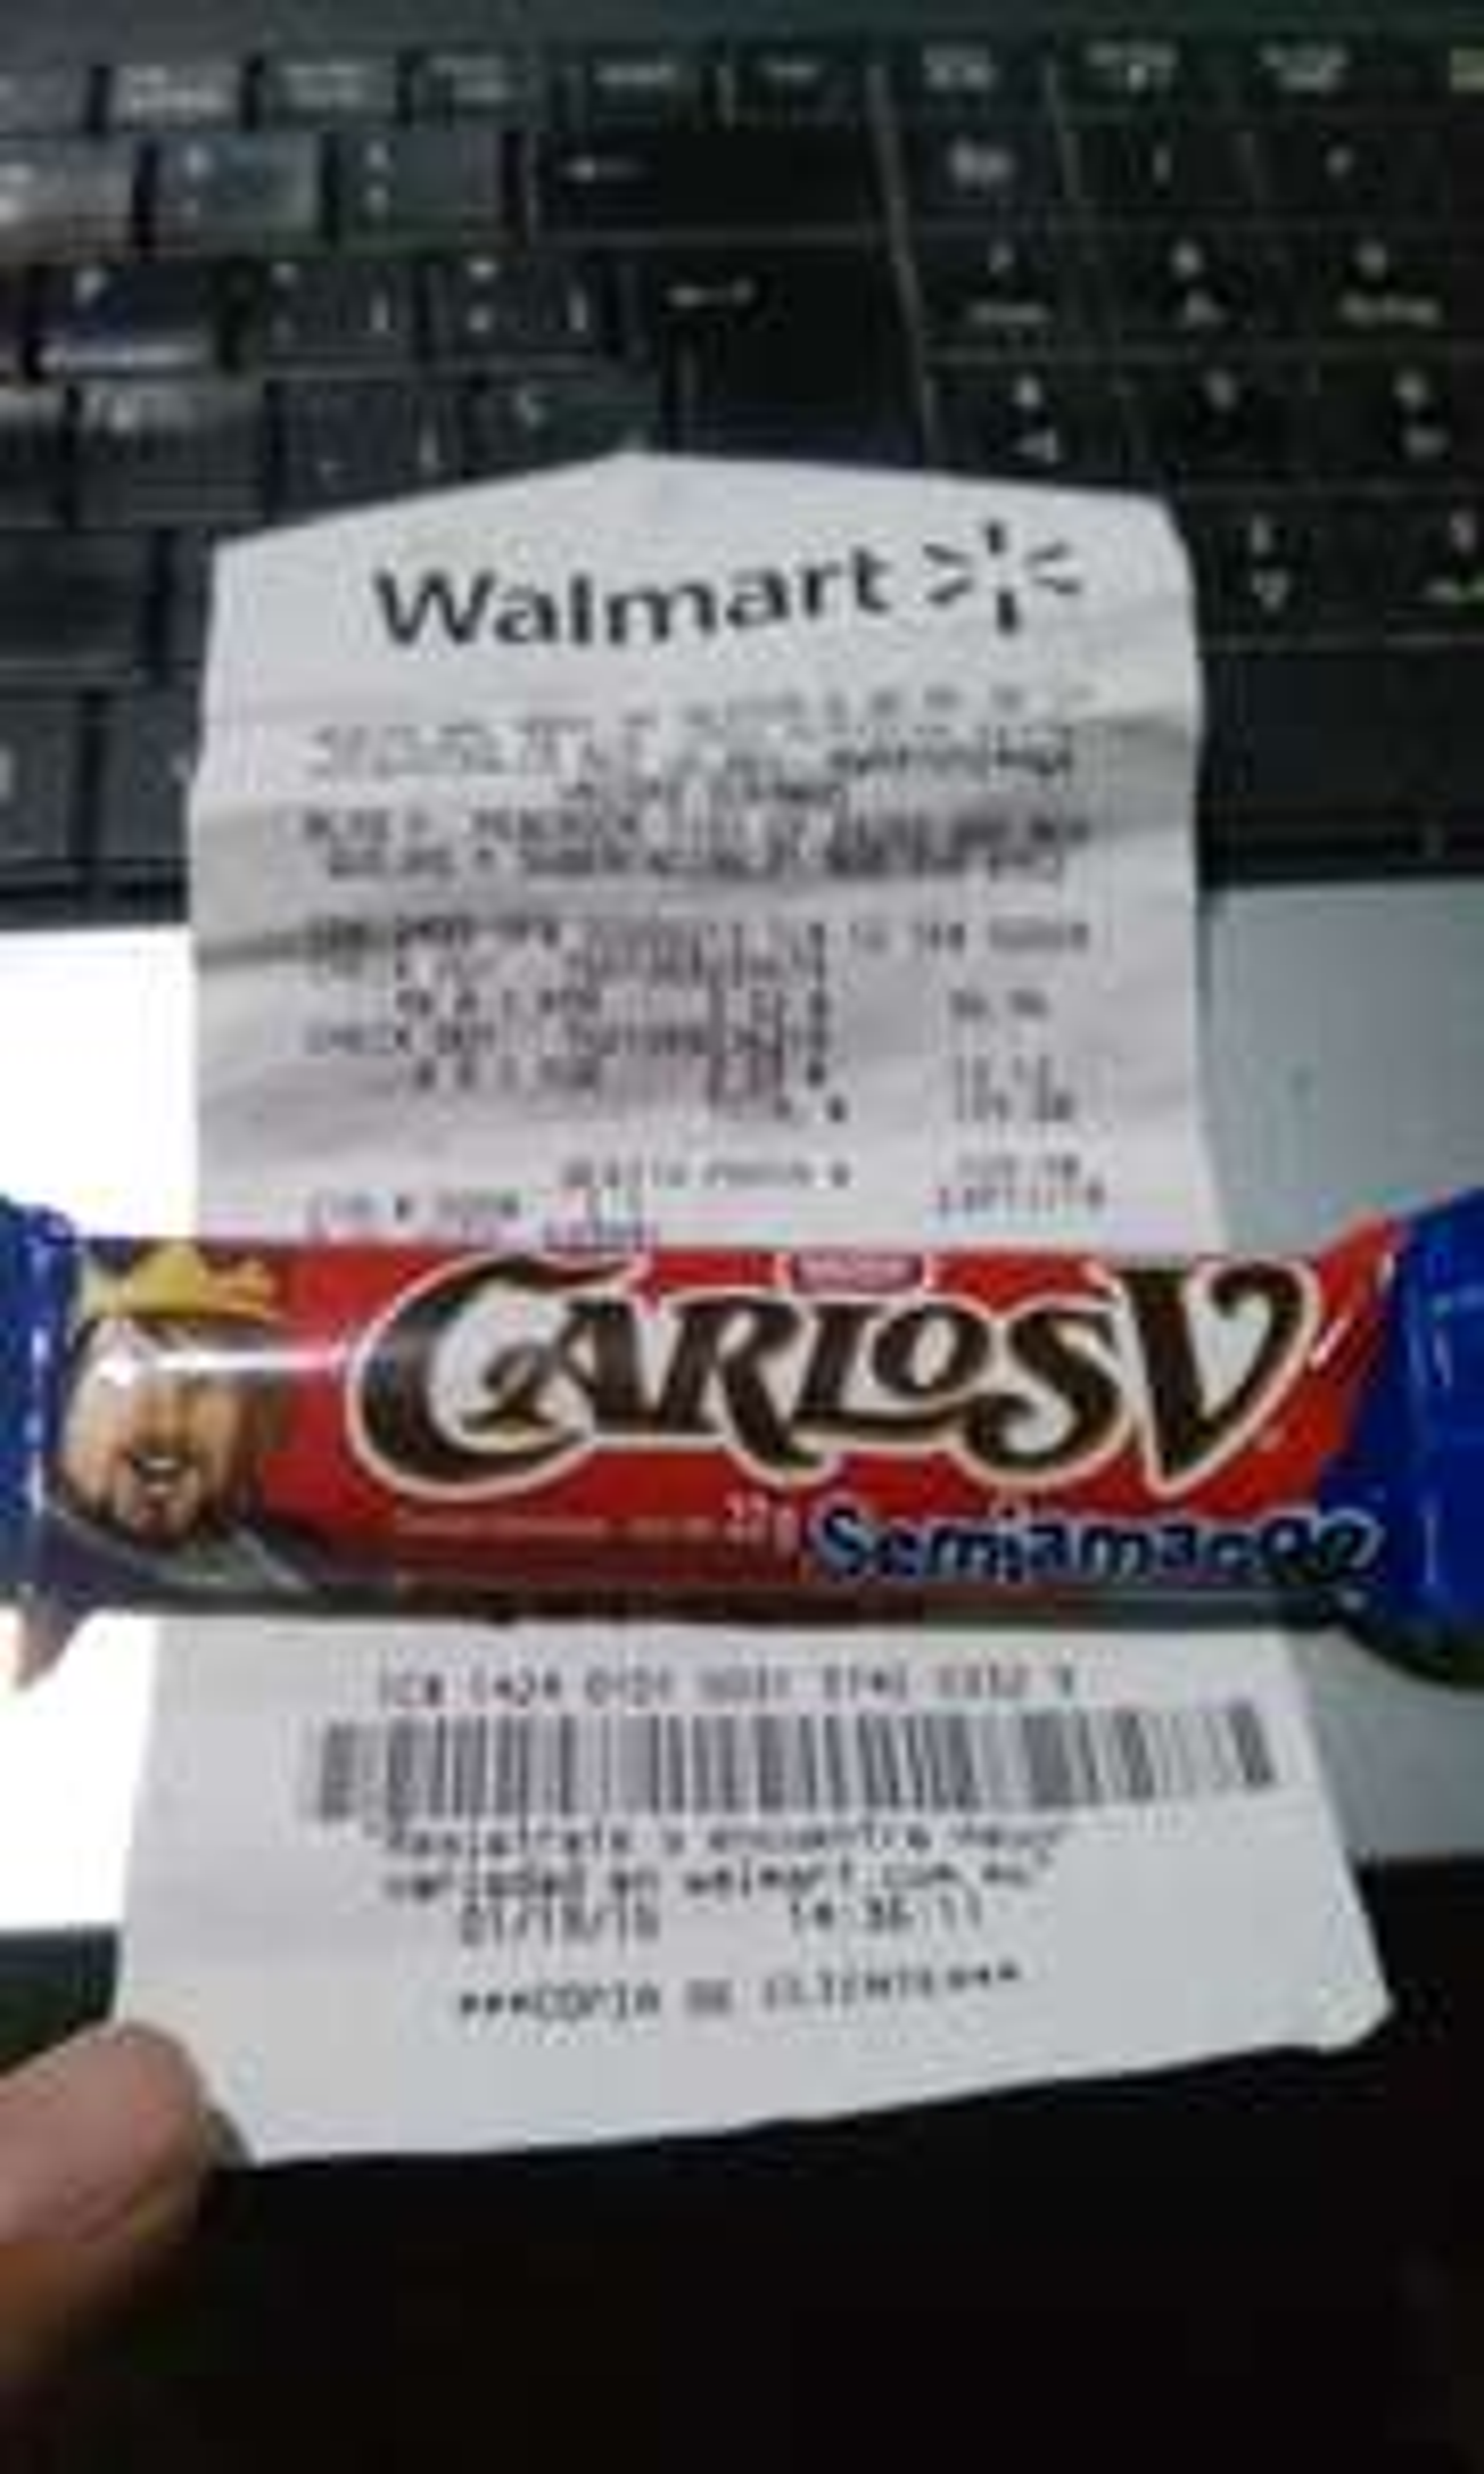 Walmart: Carlos V Semiamargo $2.02